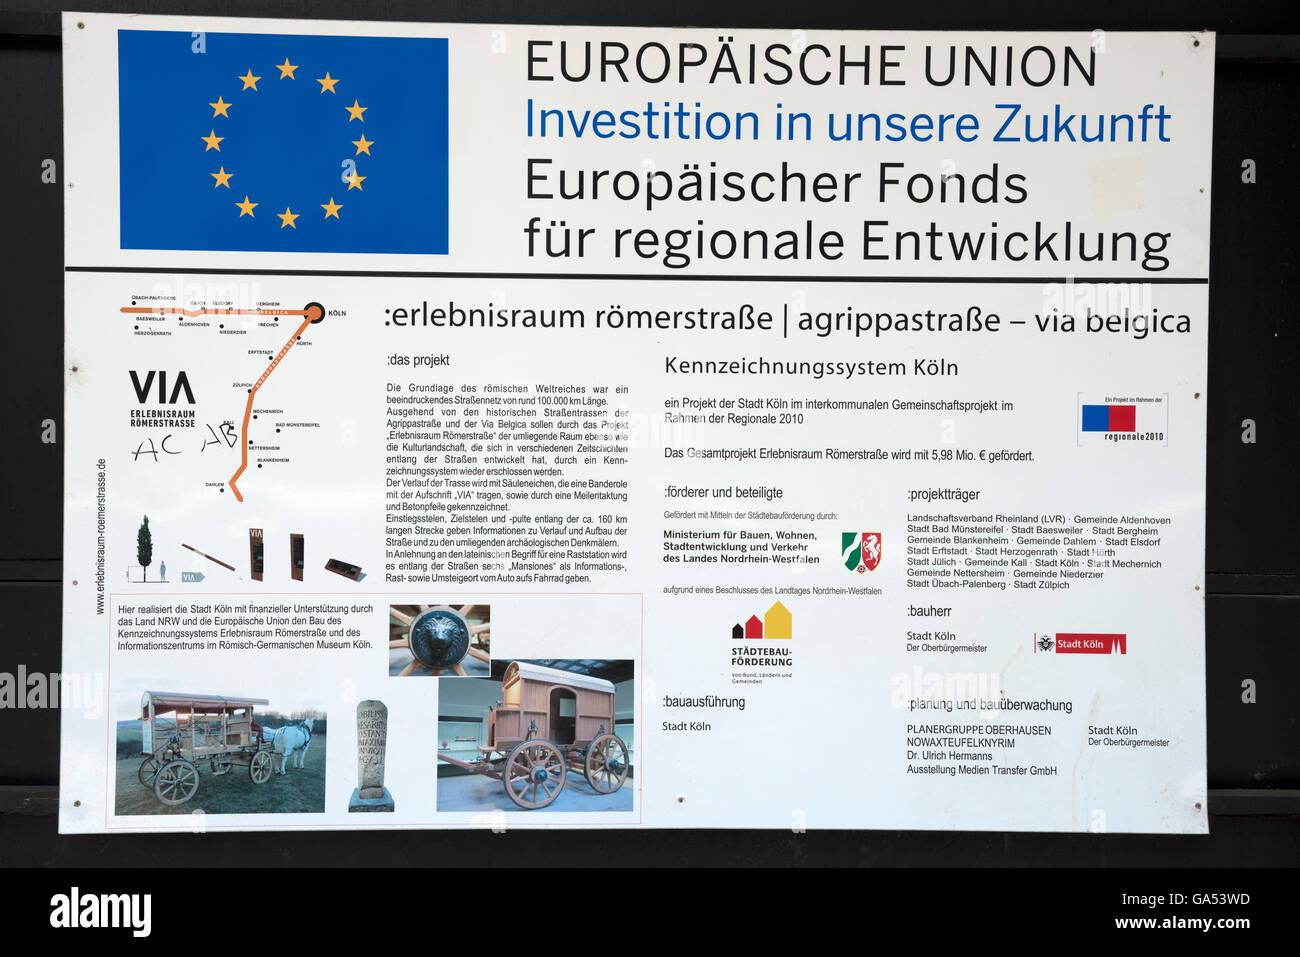 European Union funding sign (Germany) - Stock Image